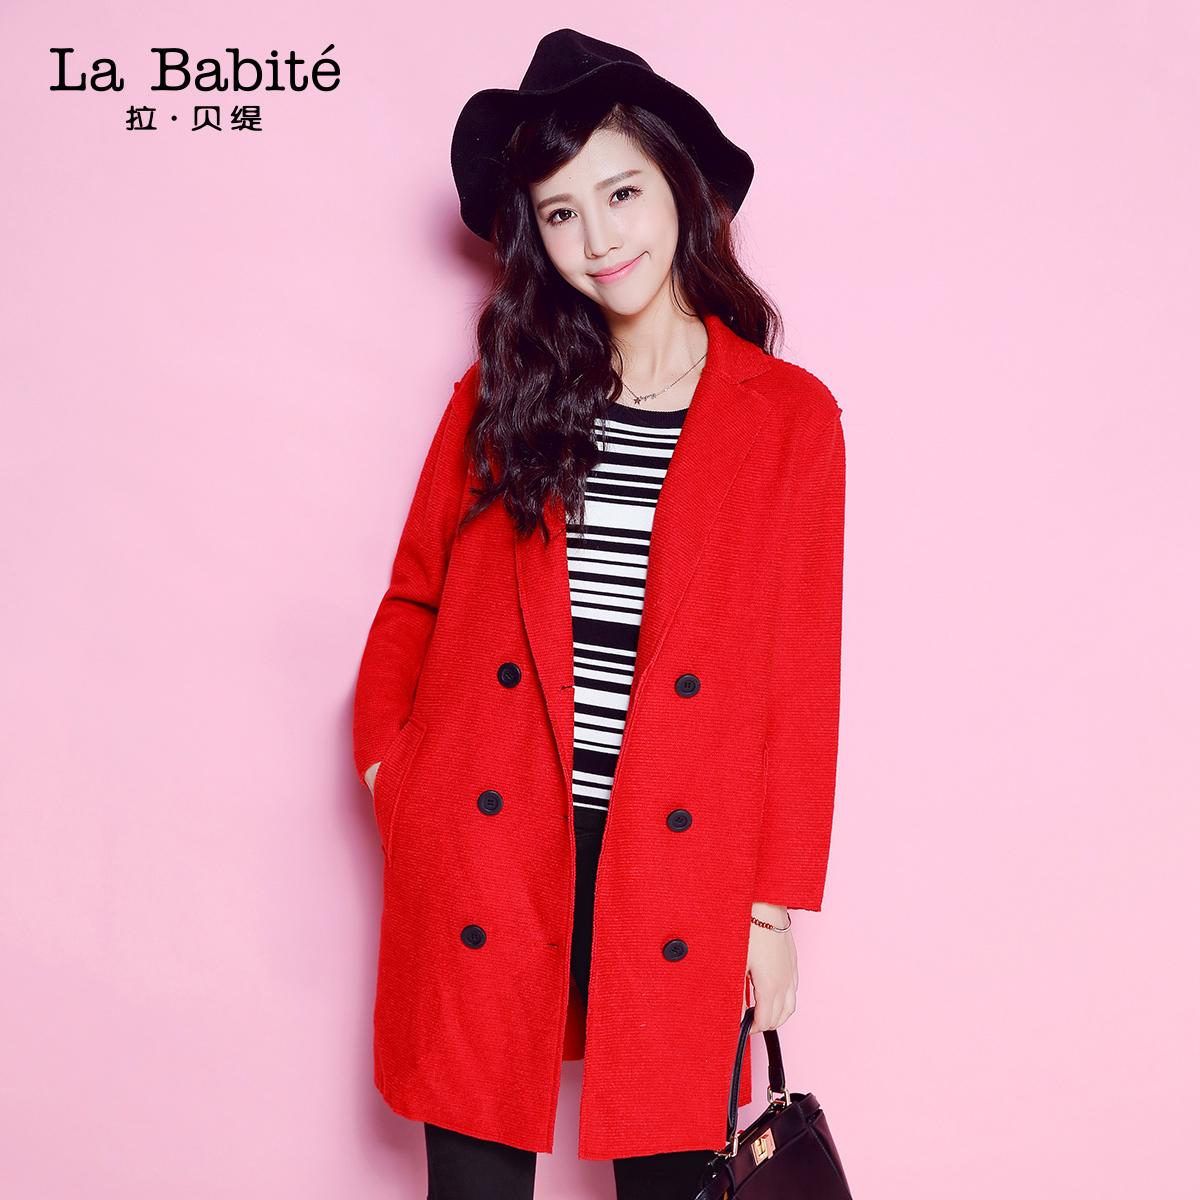 La Babite毛呢外套女装质量怎么样,是什么牌子